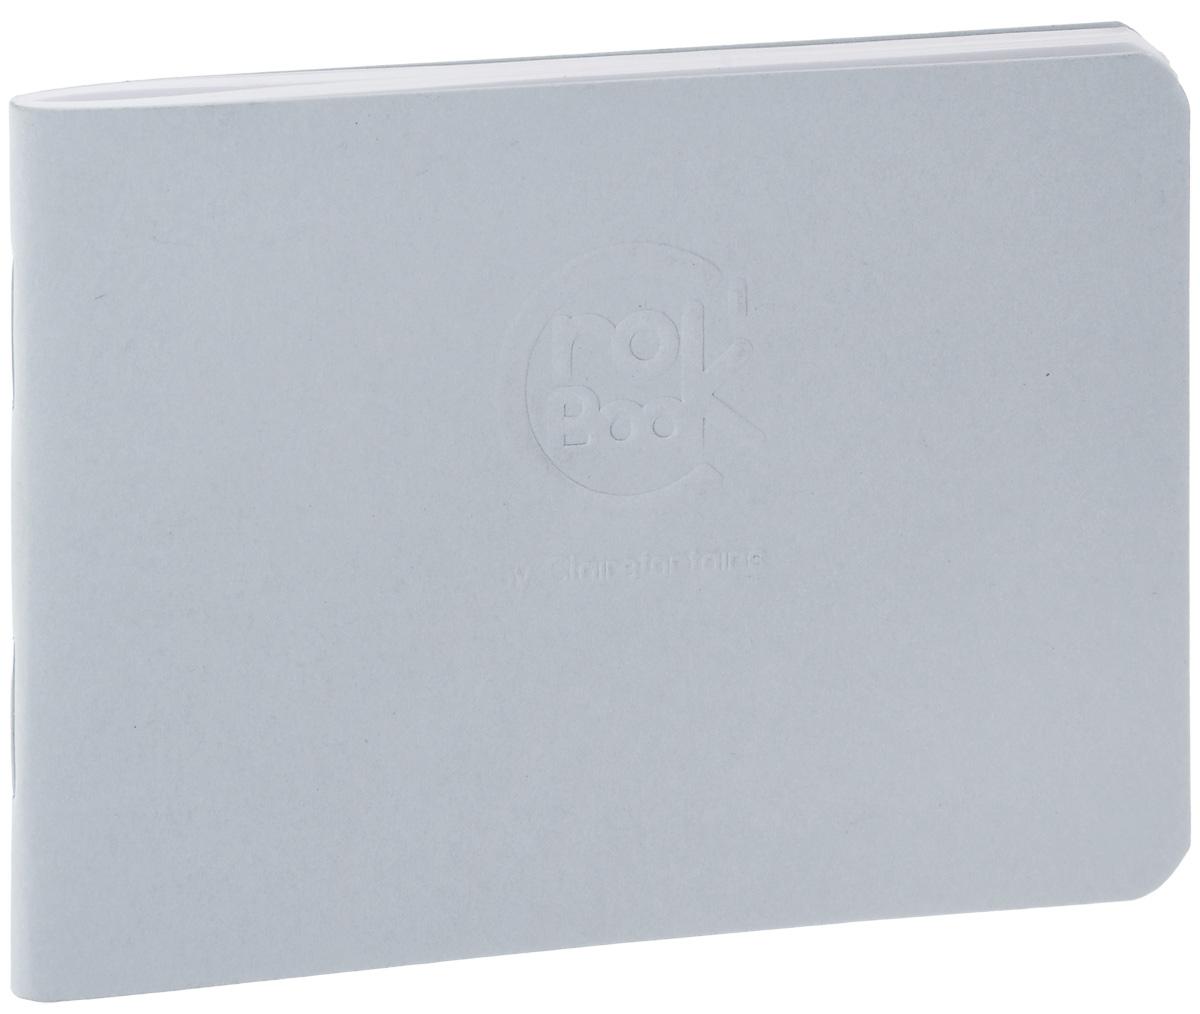 Блокнот Clairefontaine Crok Book, цвет: серый, формат A7, 24 листа2 0000000 32771Блокнот Clairefontaine Crok Book, цвет: серый, формат A7, 24 листа